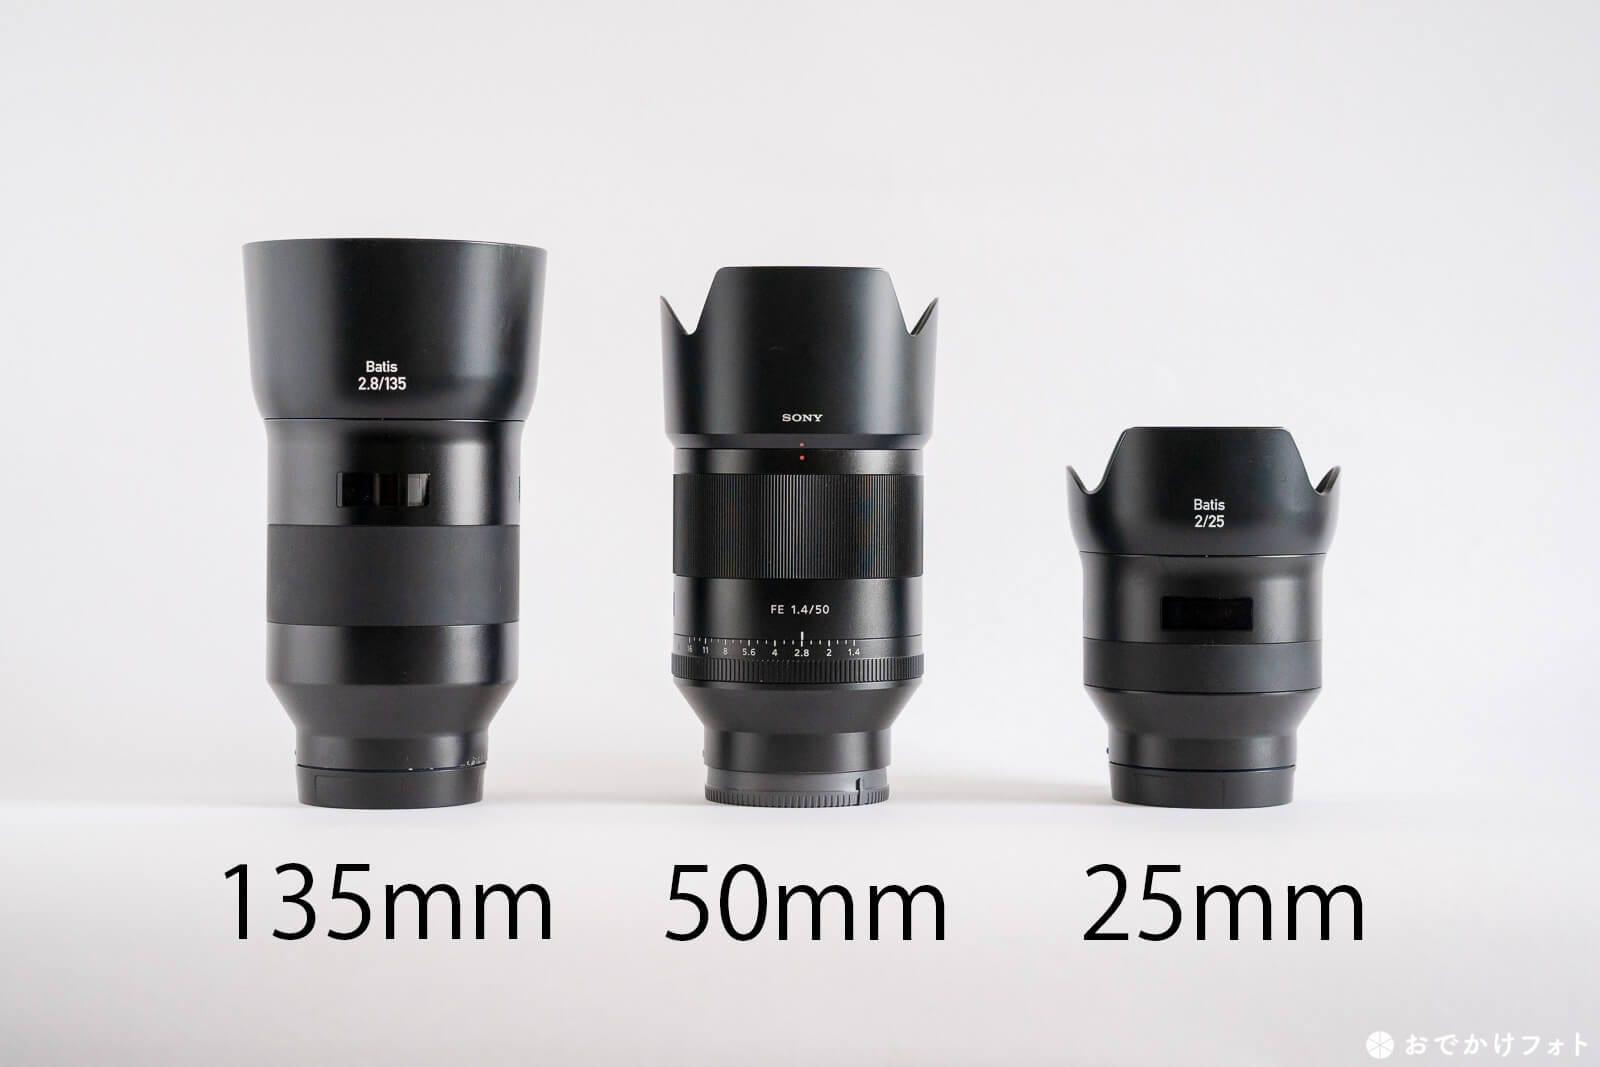 sony emount lens